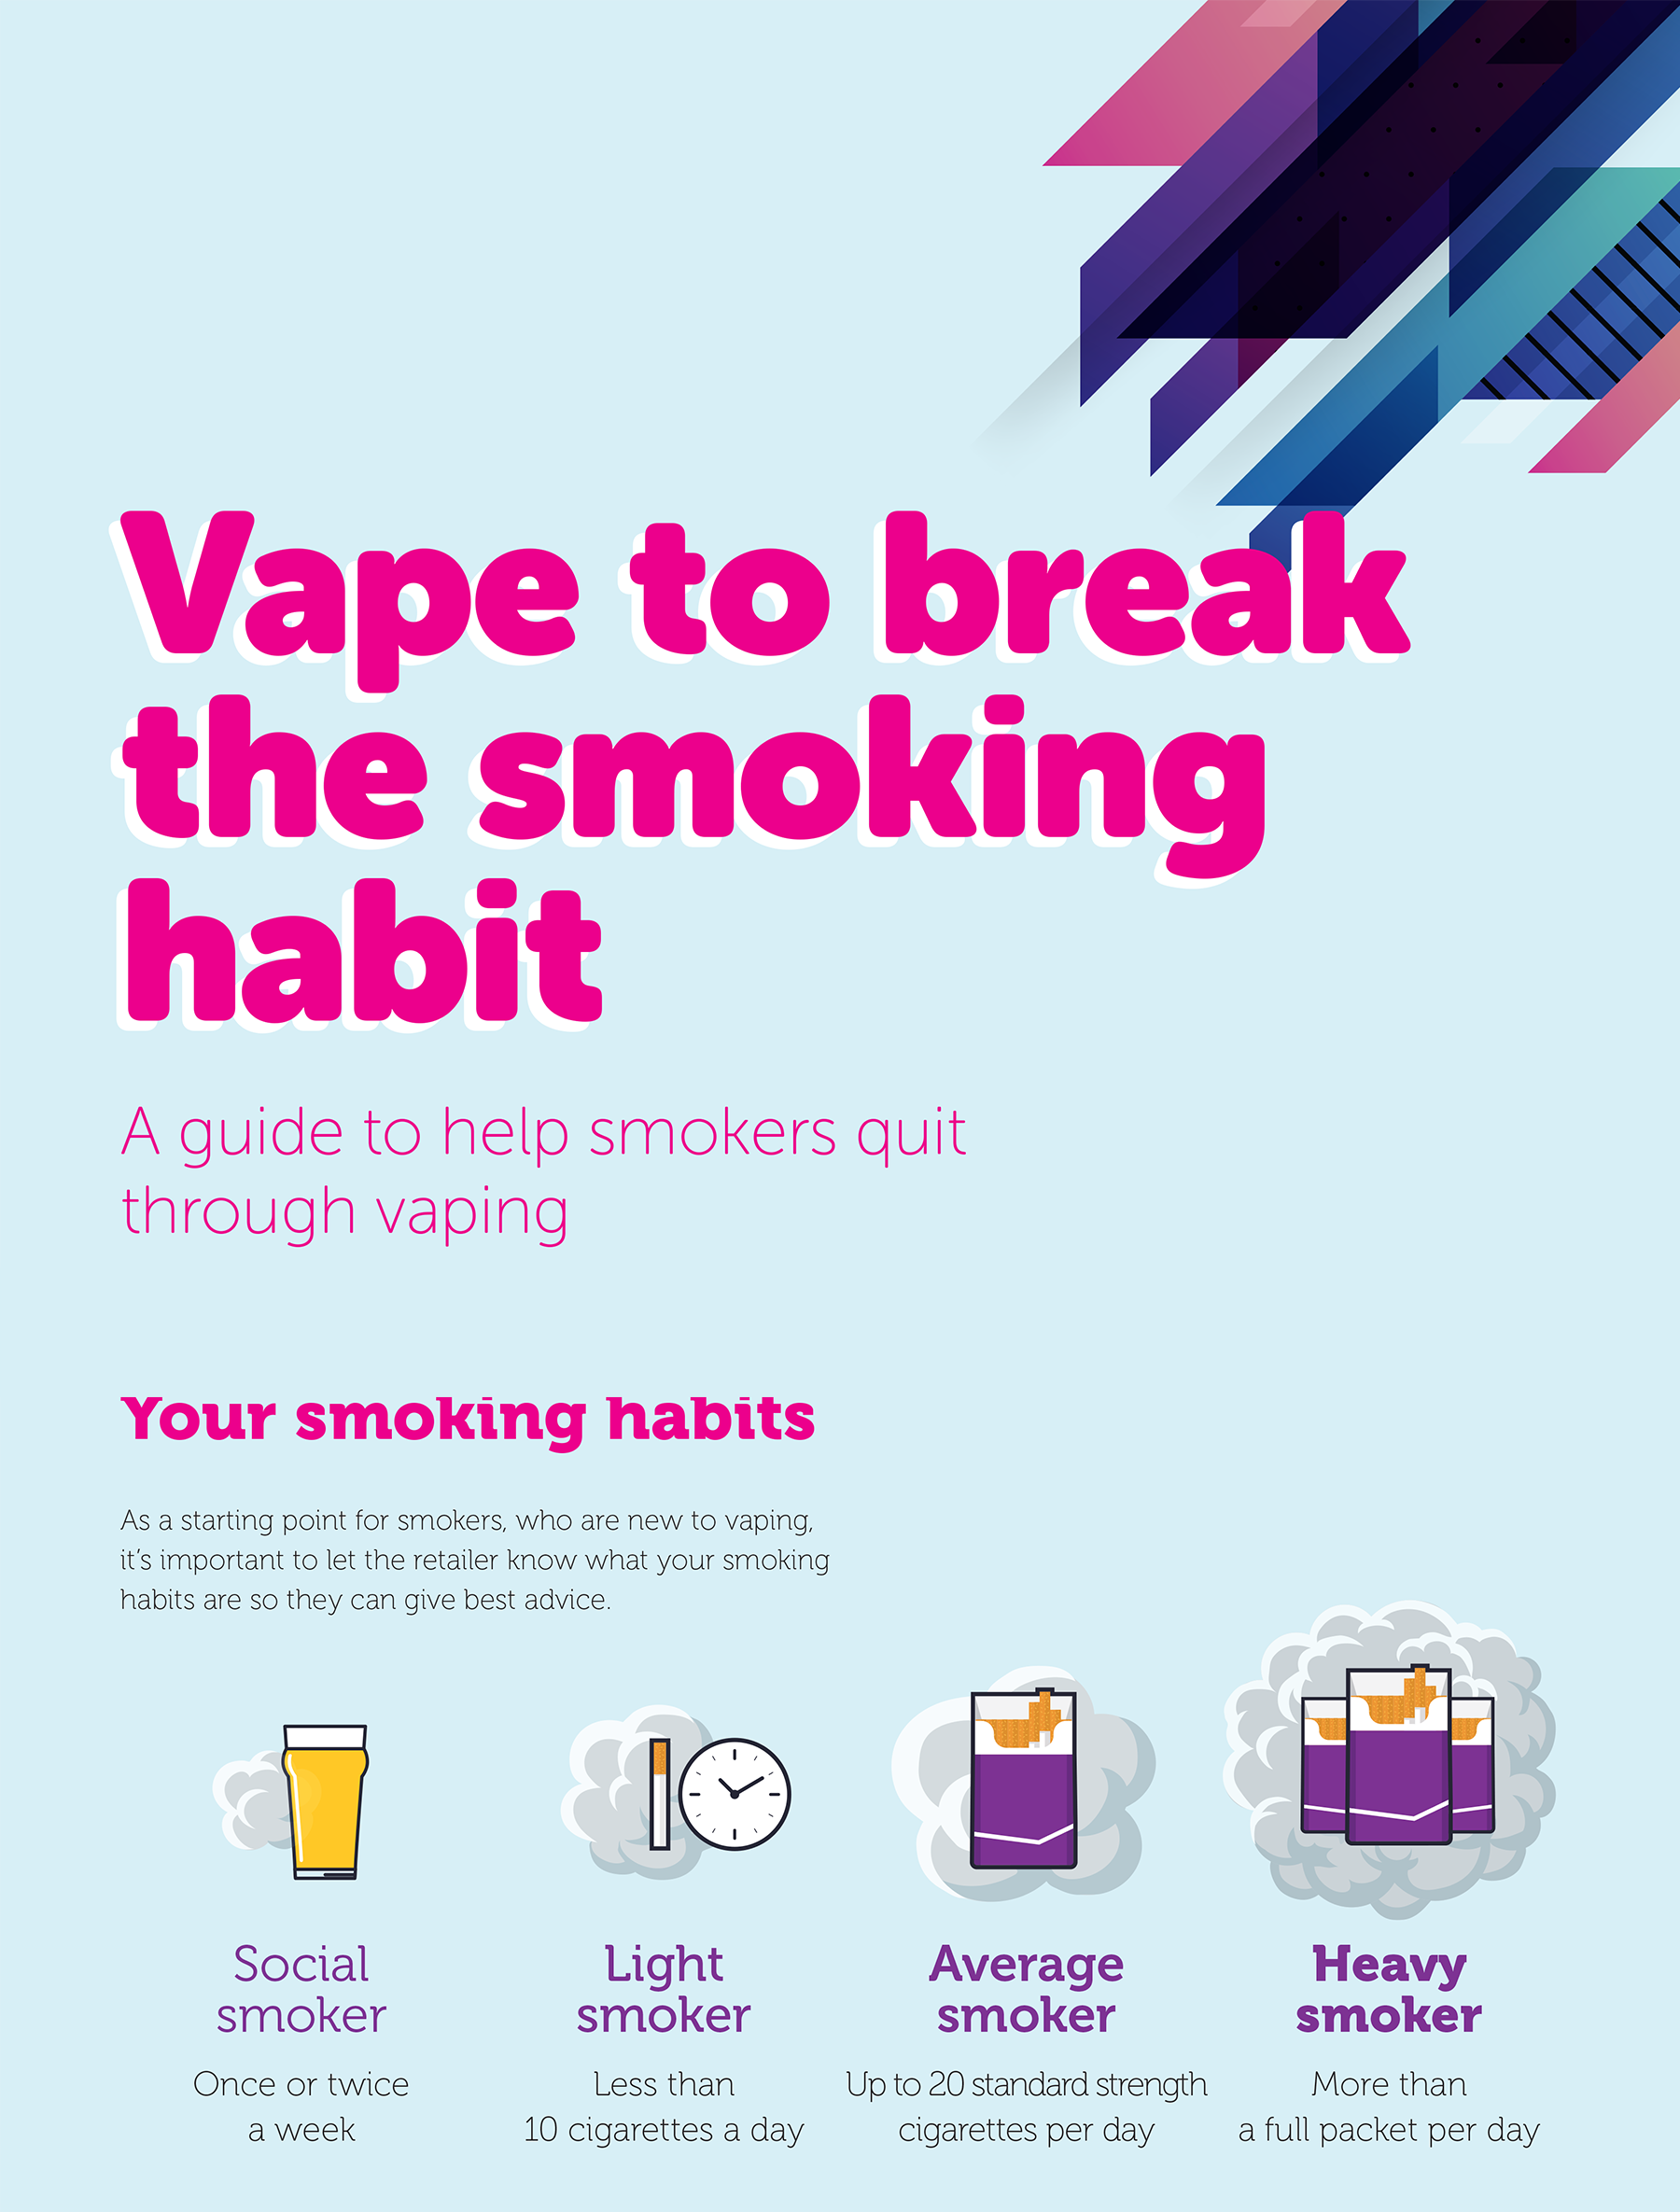 VAPE TO BREAK THE SMOKING HABIT